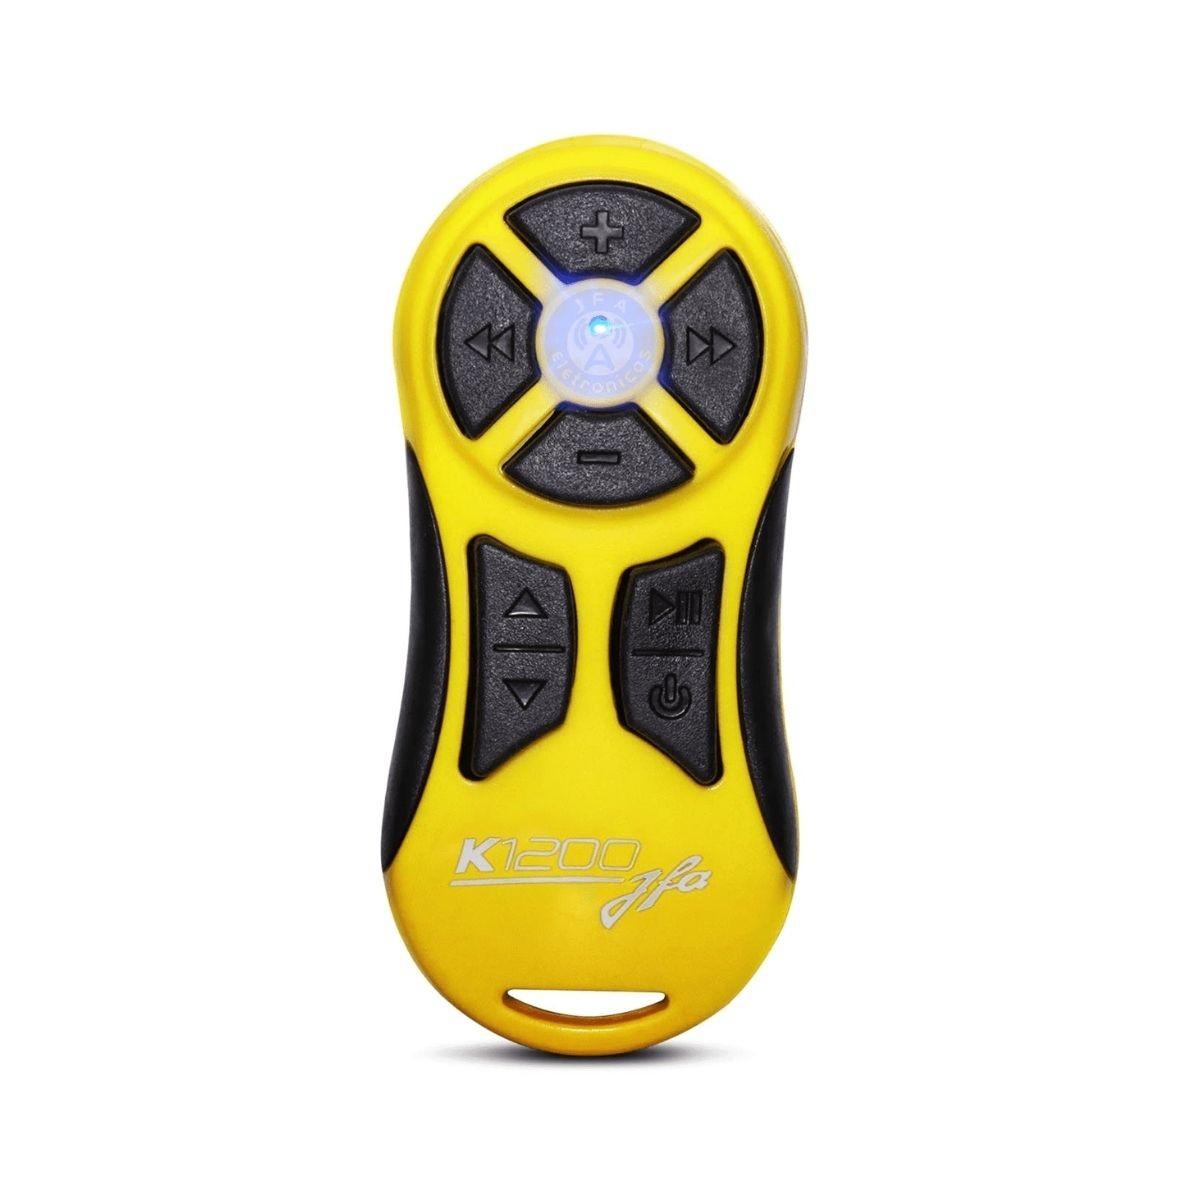 Controle Longa Distância JFA K1200 Completo Amarelo